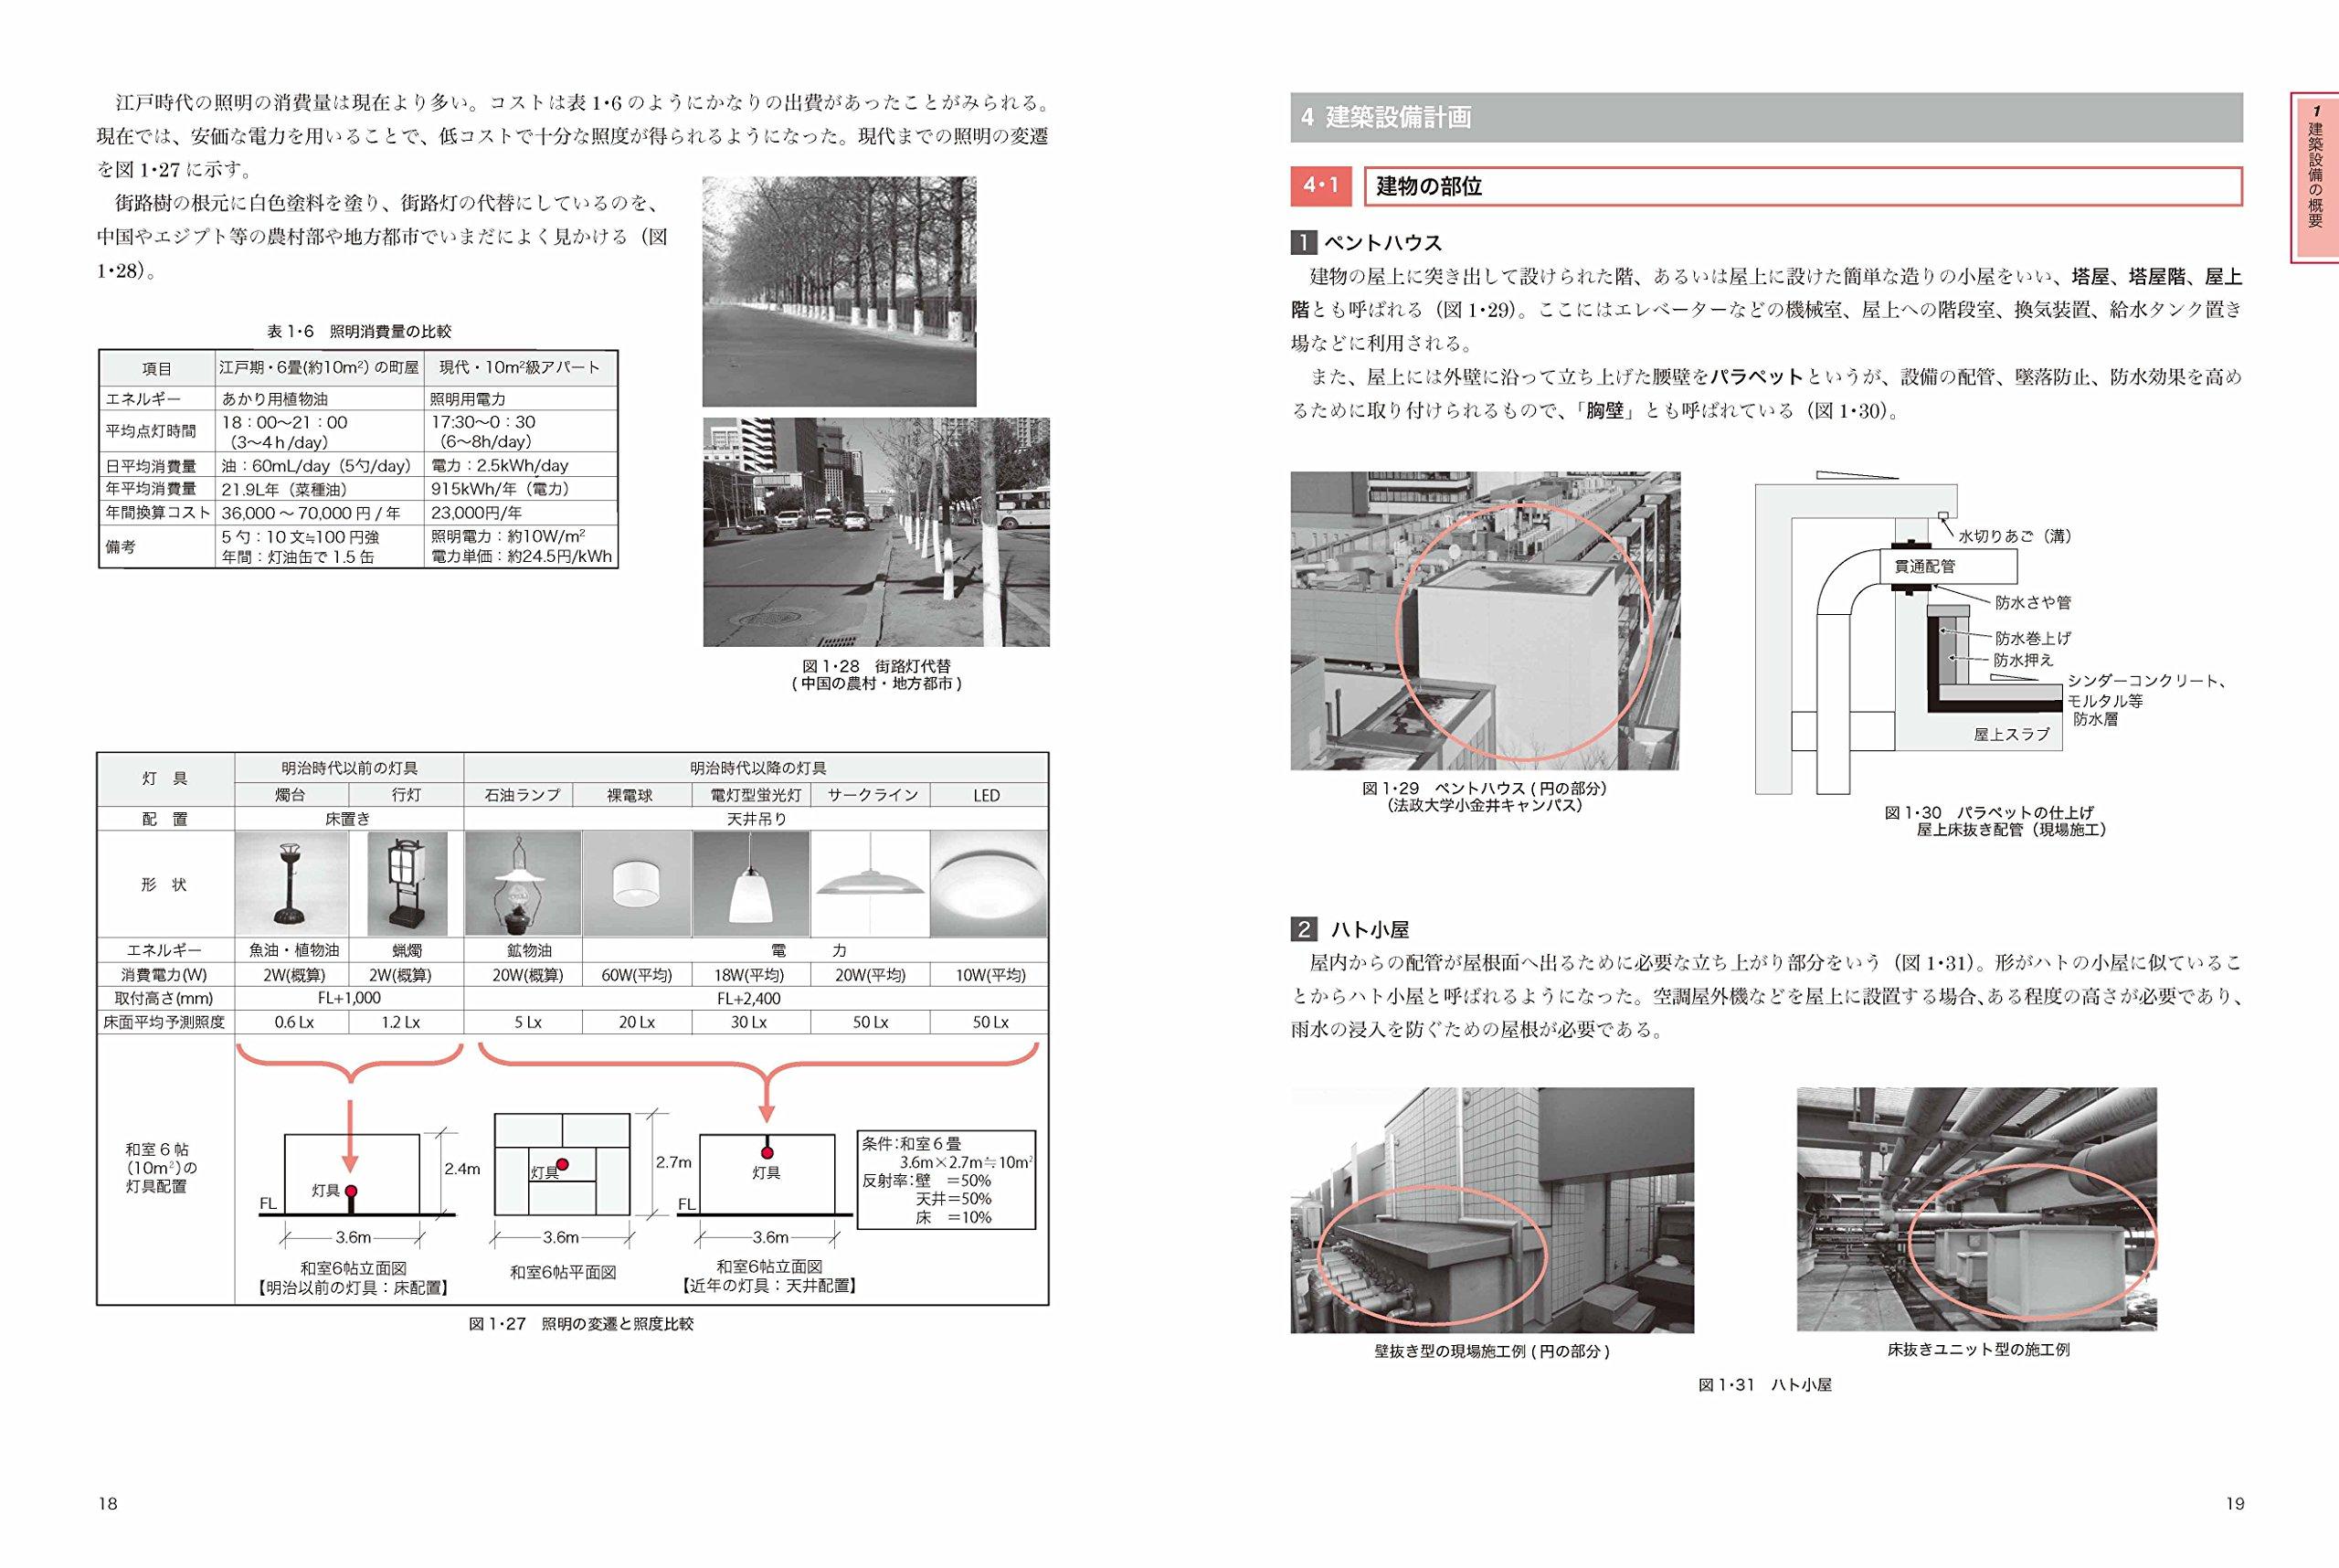 https://images-na.ssl-images-amazon.com/images/I/91USOPMXl%2BL.jpg